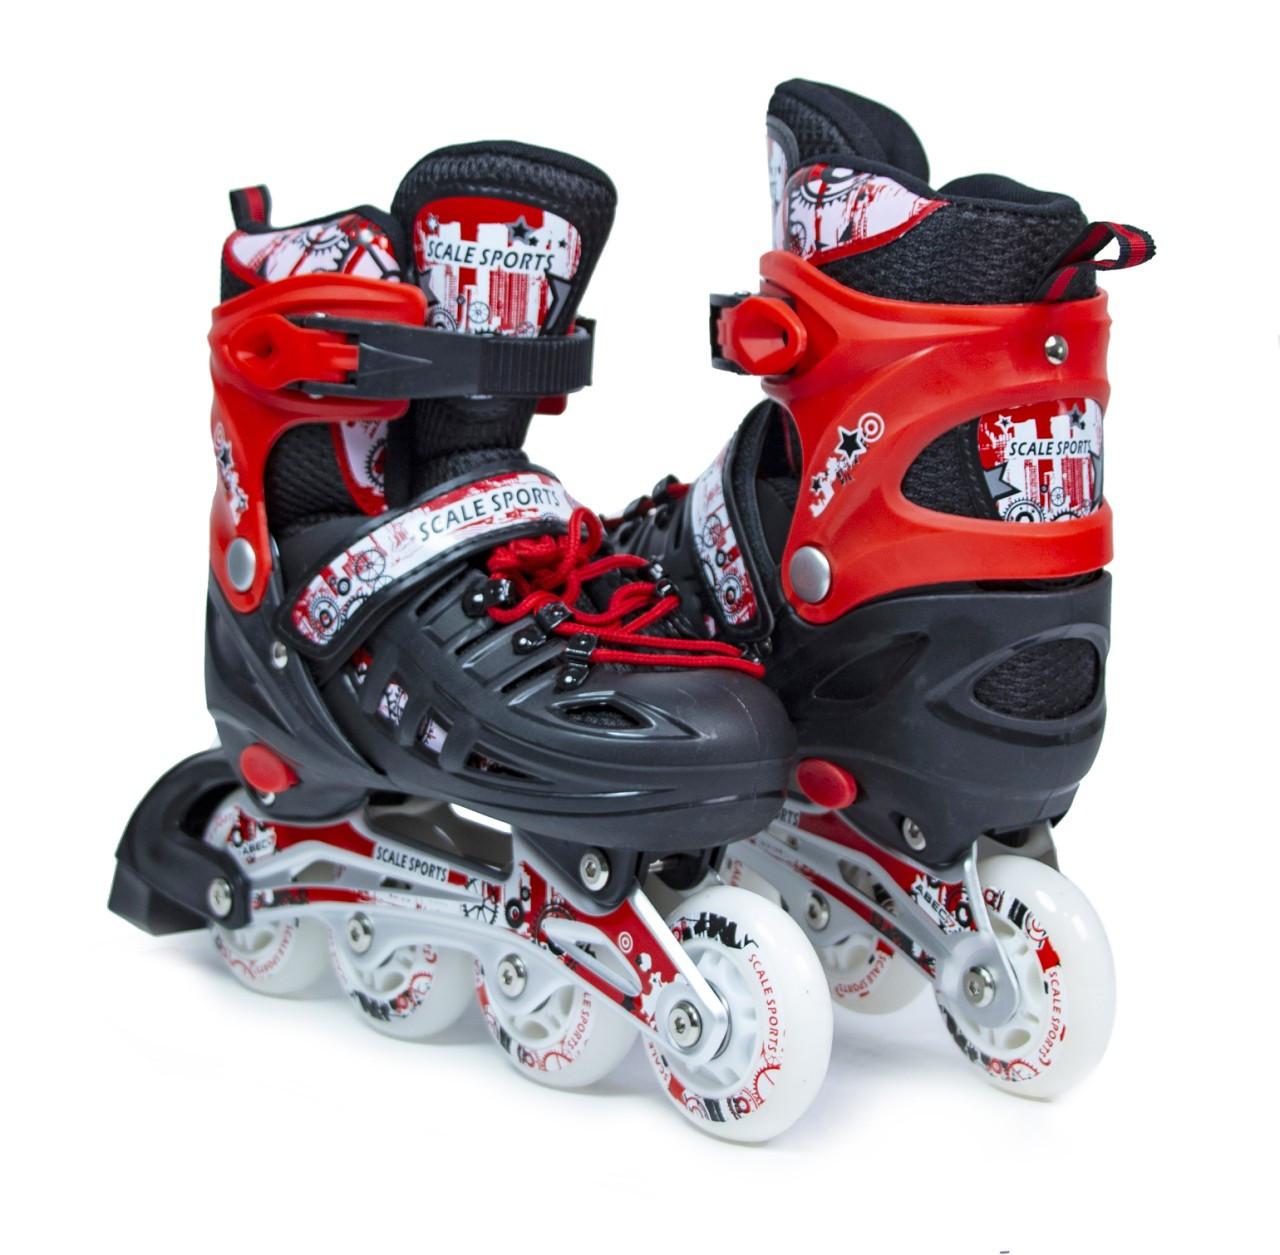 Ролики Scale Sports Red, размер 34-37